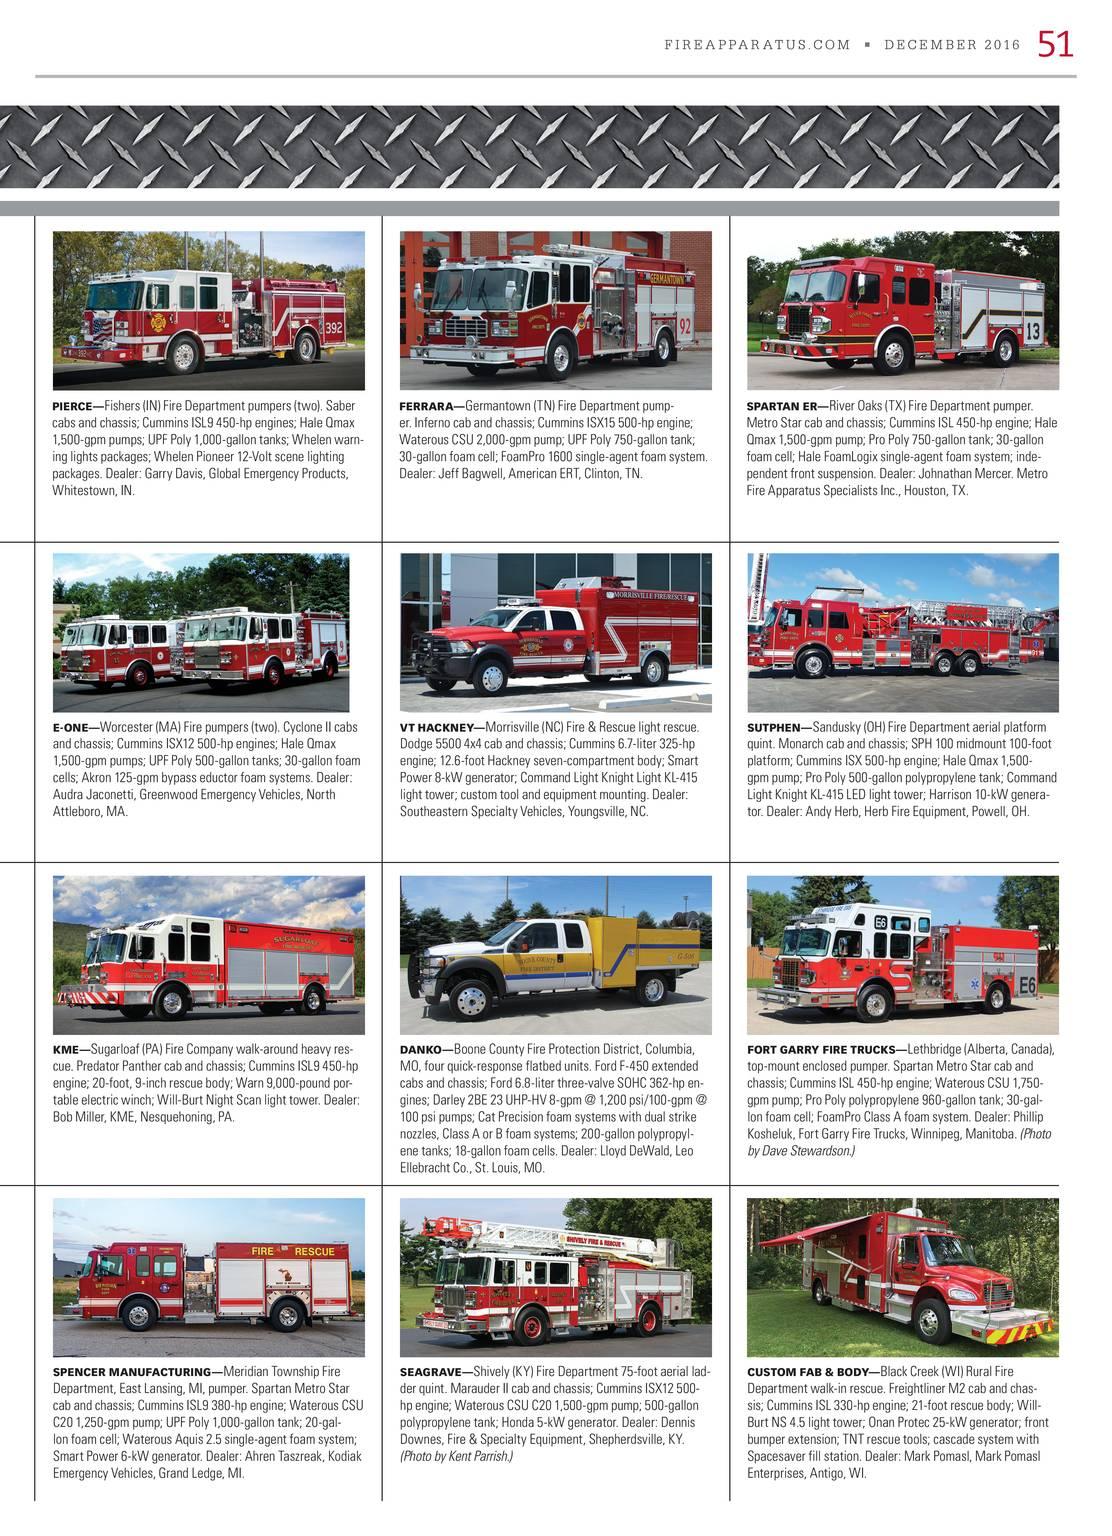 Fire Apparatus Magazine - December 2016 - page 52